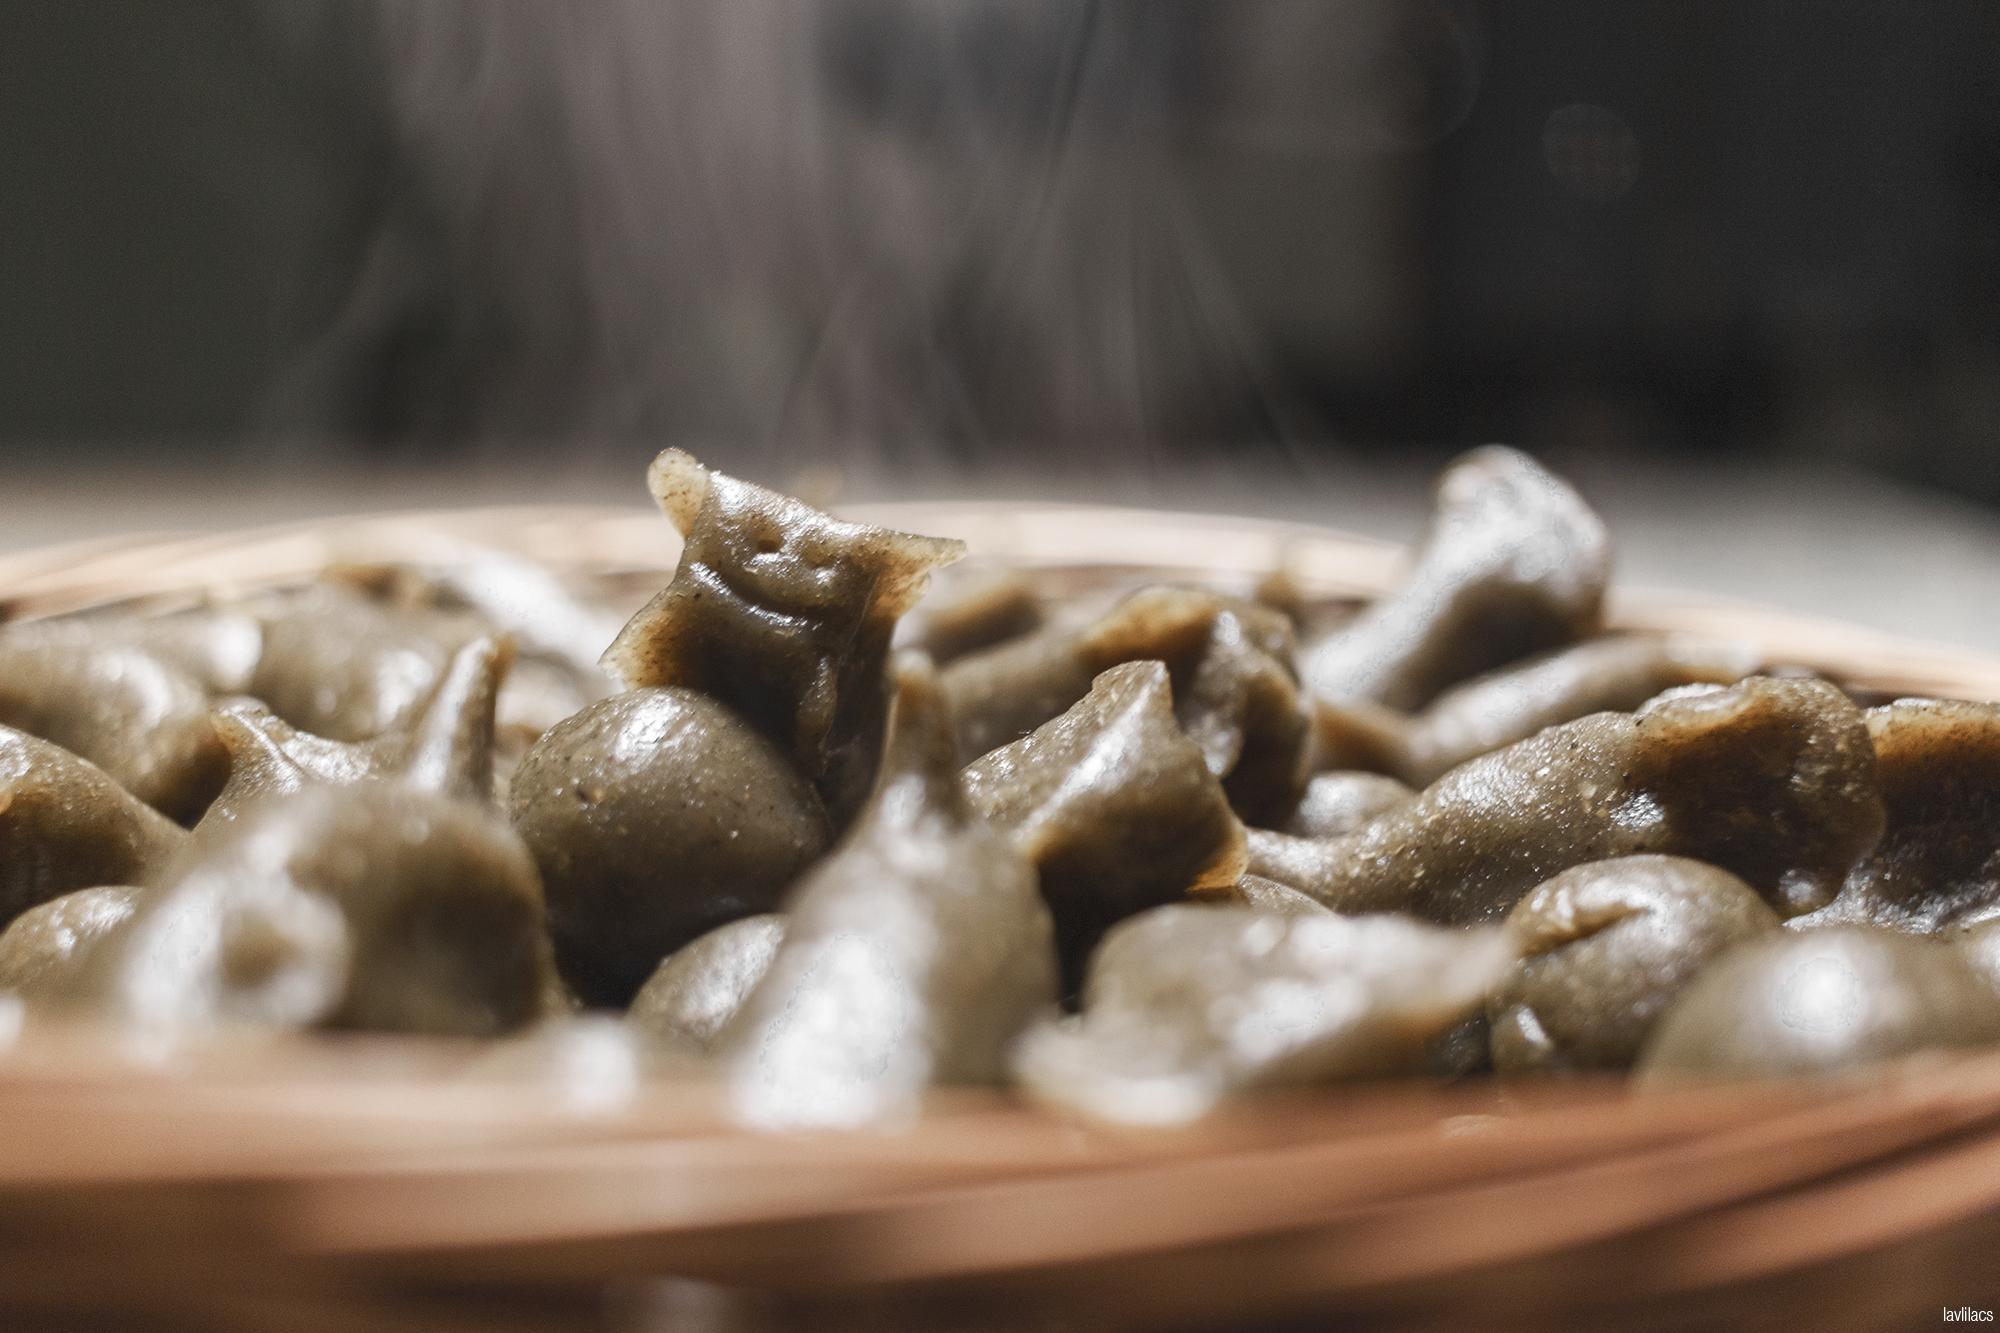 lavlilacs | Taishan Eats 台山美食 | Skunk Vine Rice Cake Balls - Foo Keen Haang Yuan - 烏芹藤圓